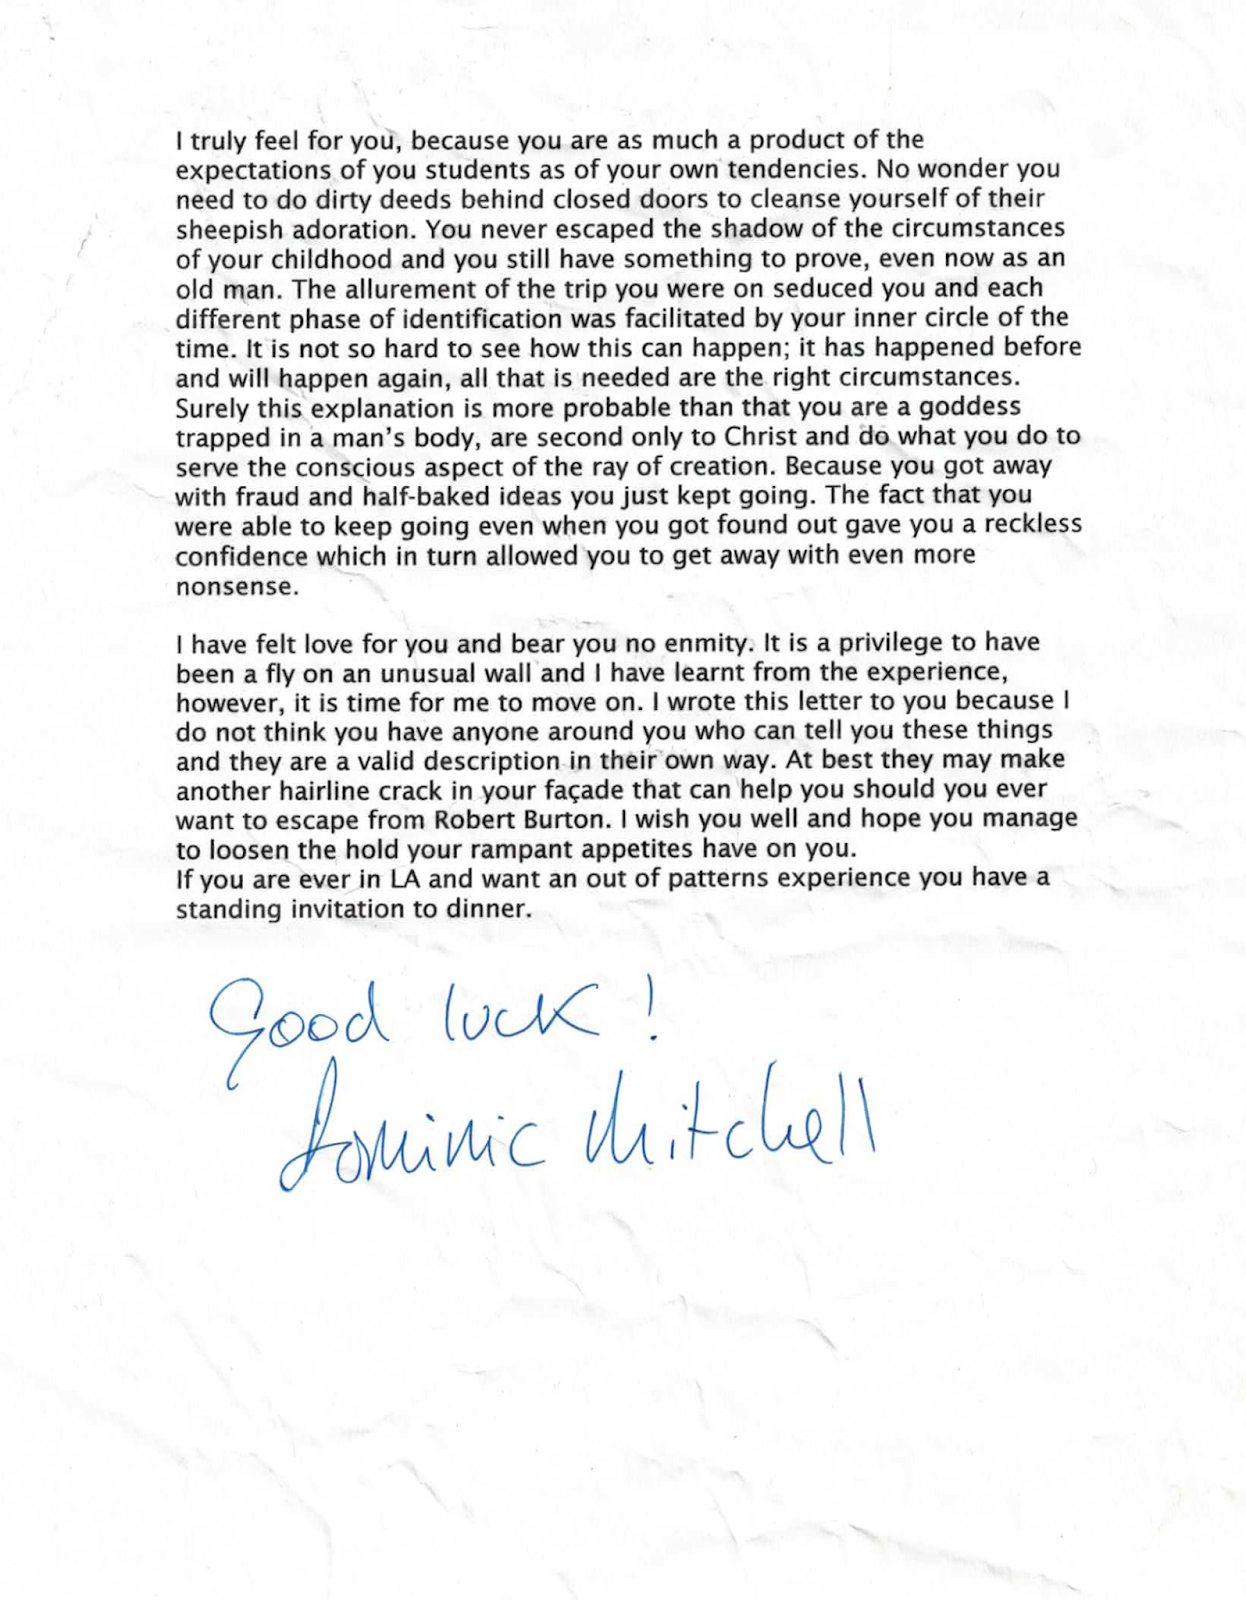 Departure letter from Robert Earl Burton's Fellowship of Friends cult